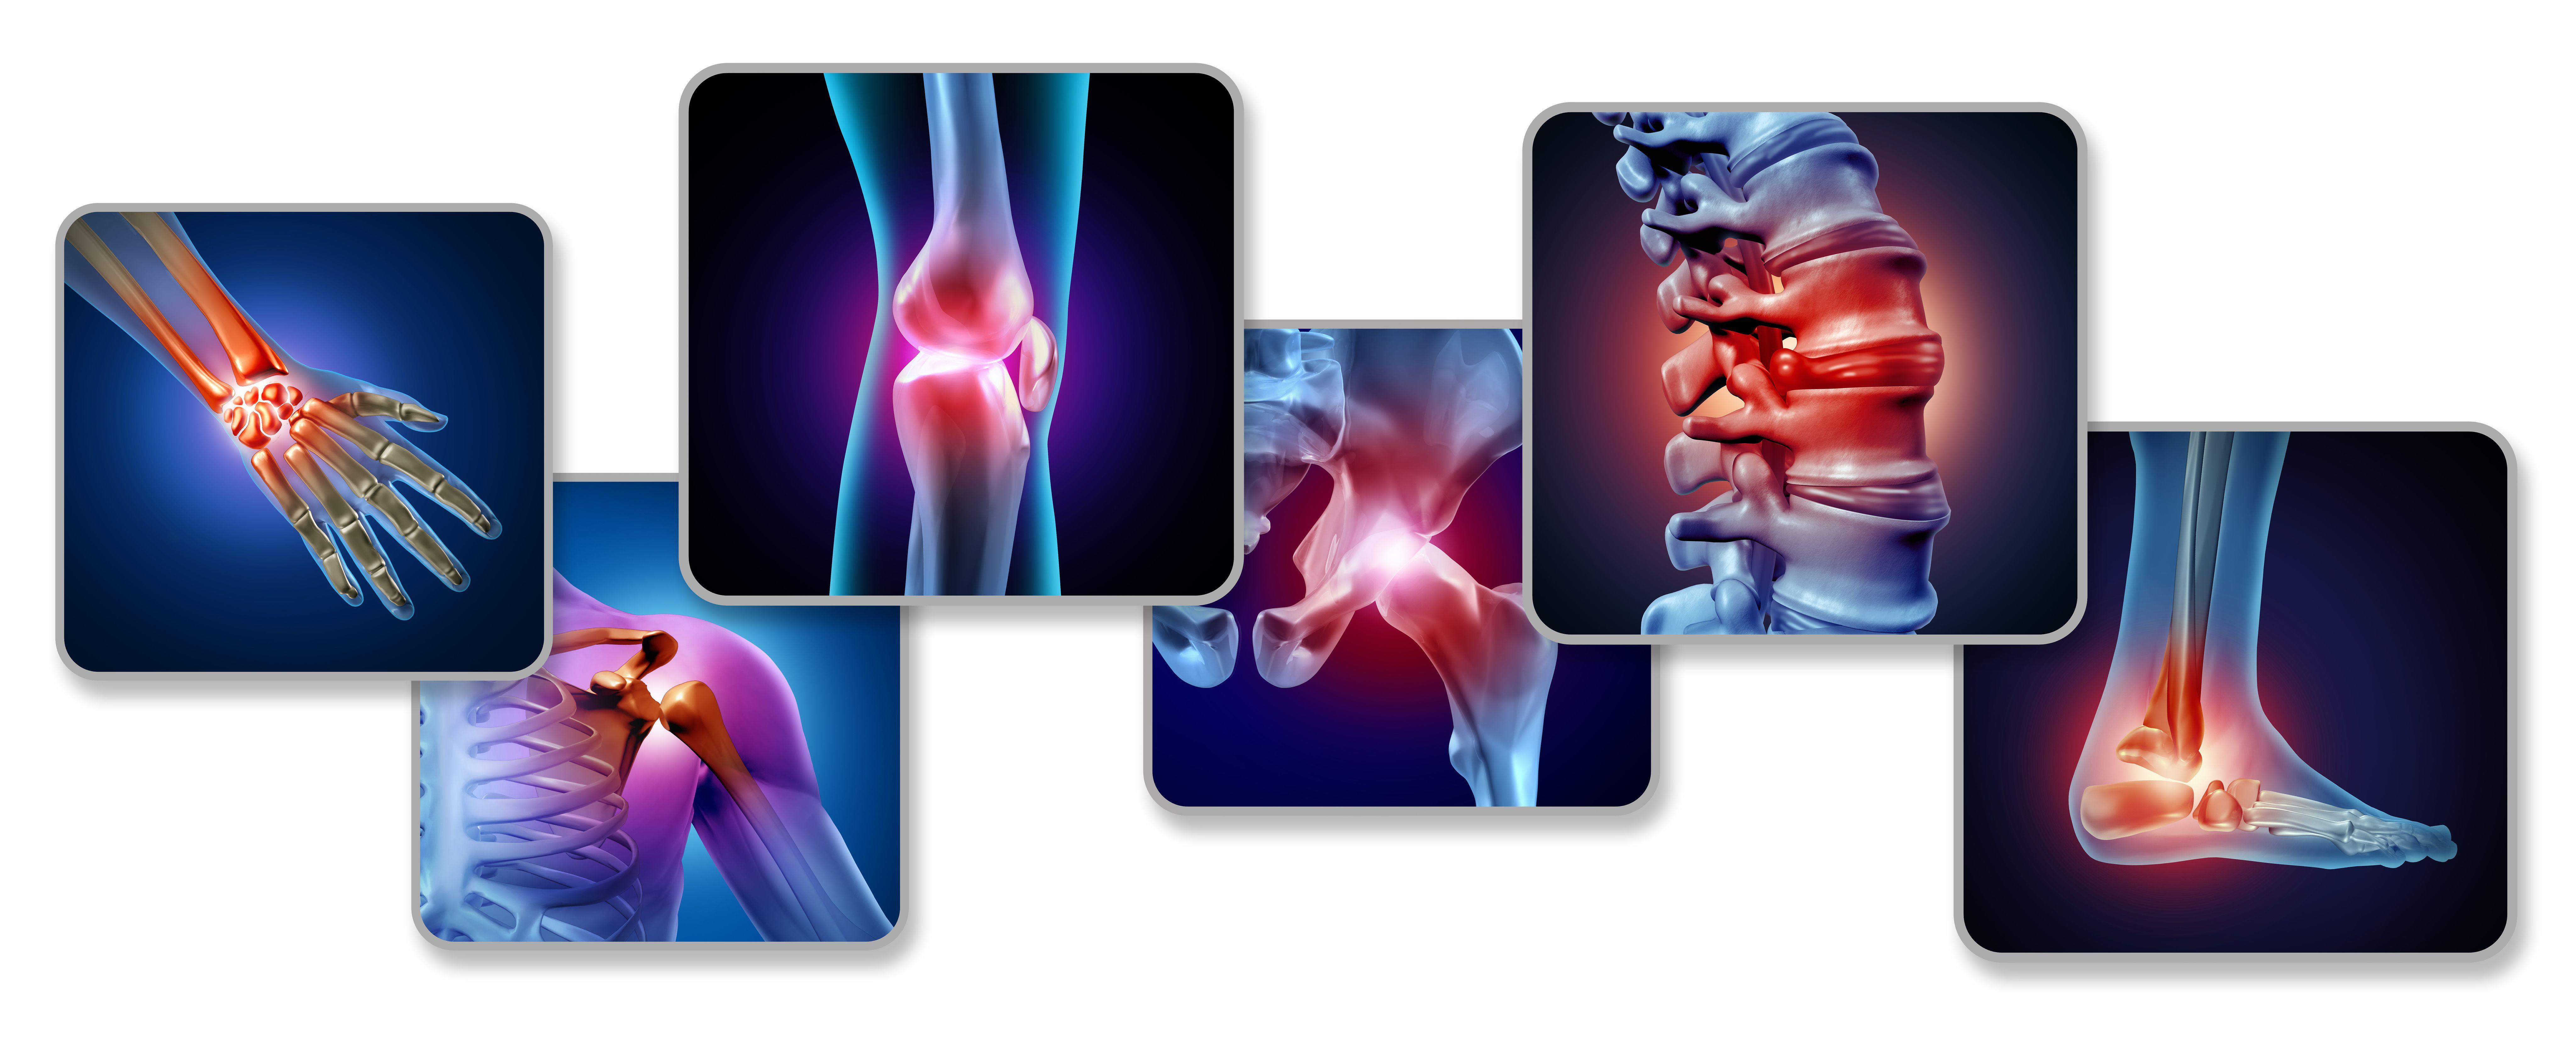 Ixekizumab Bests Adalimumab at 24 Weeks in Psoriatic Arthritic Skin, Joint Sympt